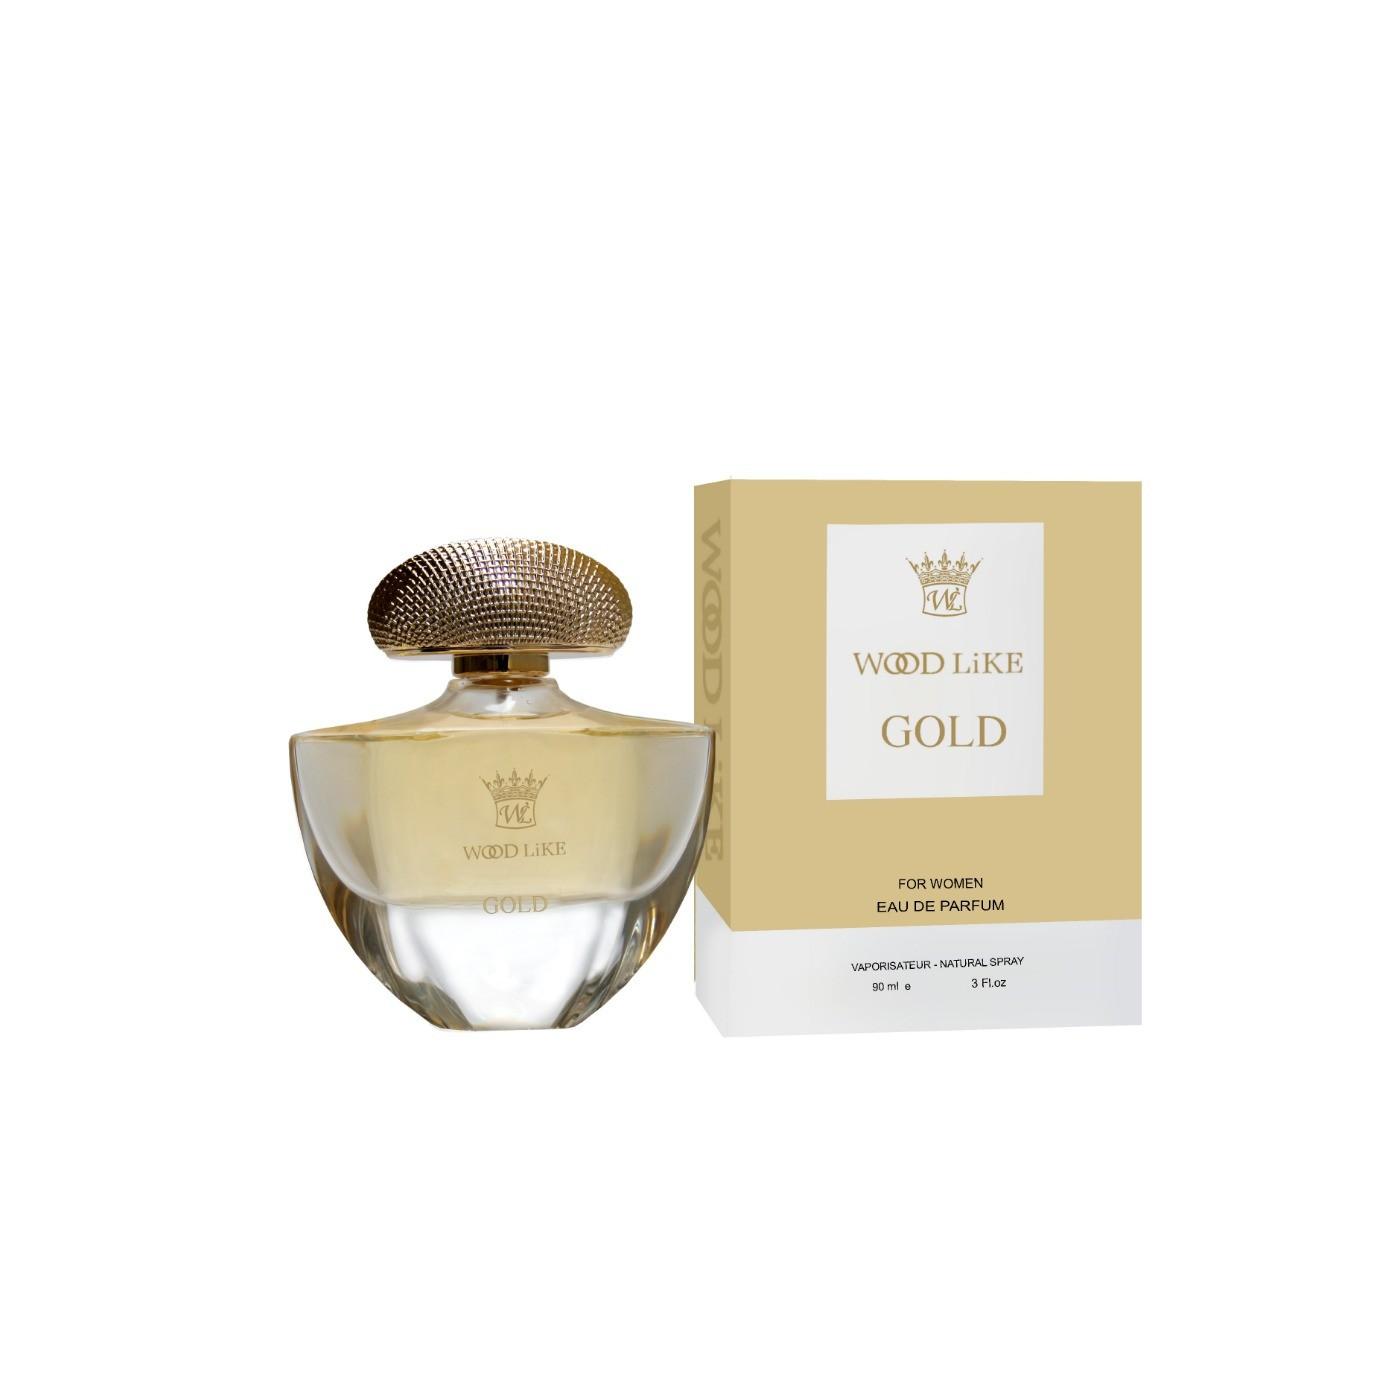 ادوپرفیوم زنانه وودلایک مدل Gold گلد 90 میلیلیتر - Woodlike Gold Eau de Parfum For Women